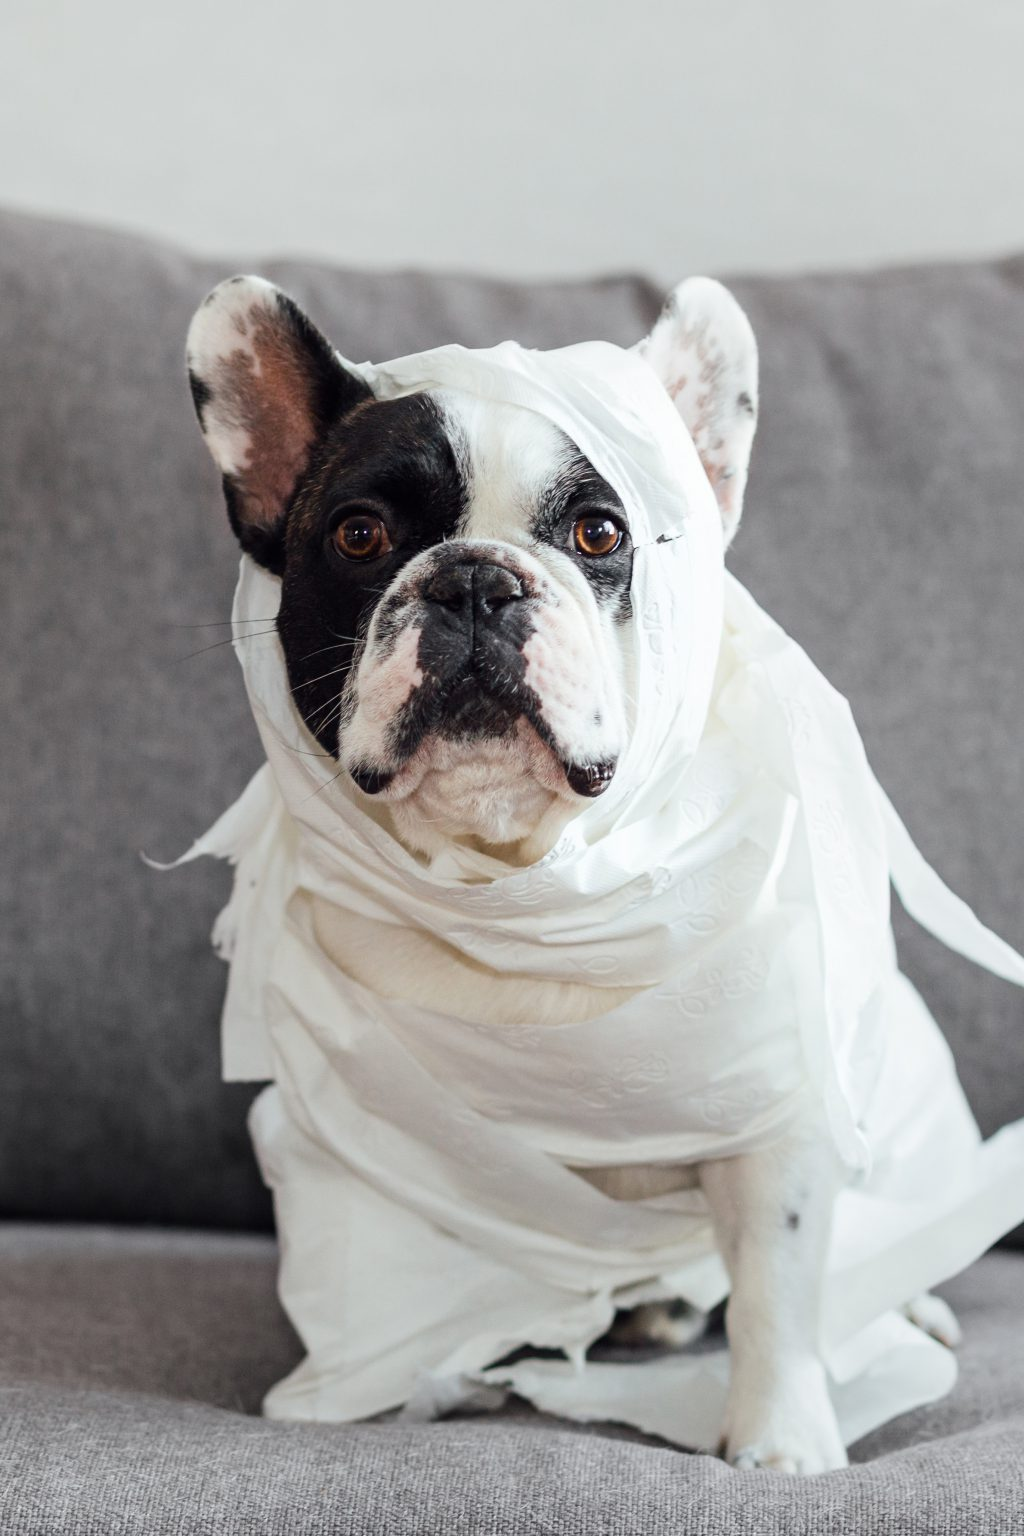 French Bulldog dressed as a mummy - free stock photo